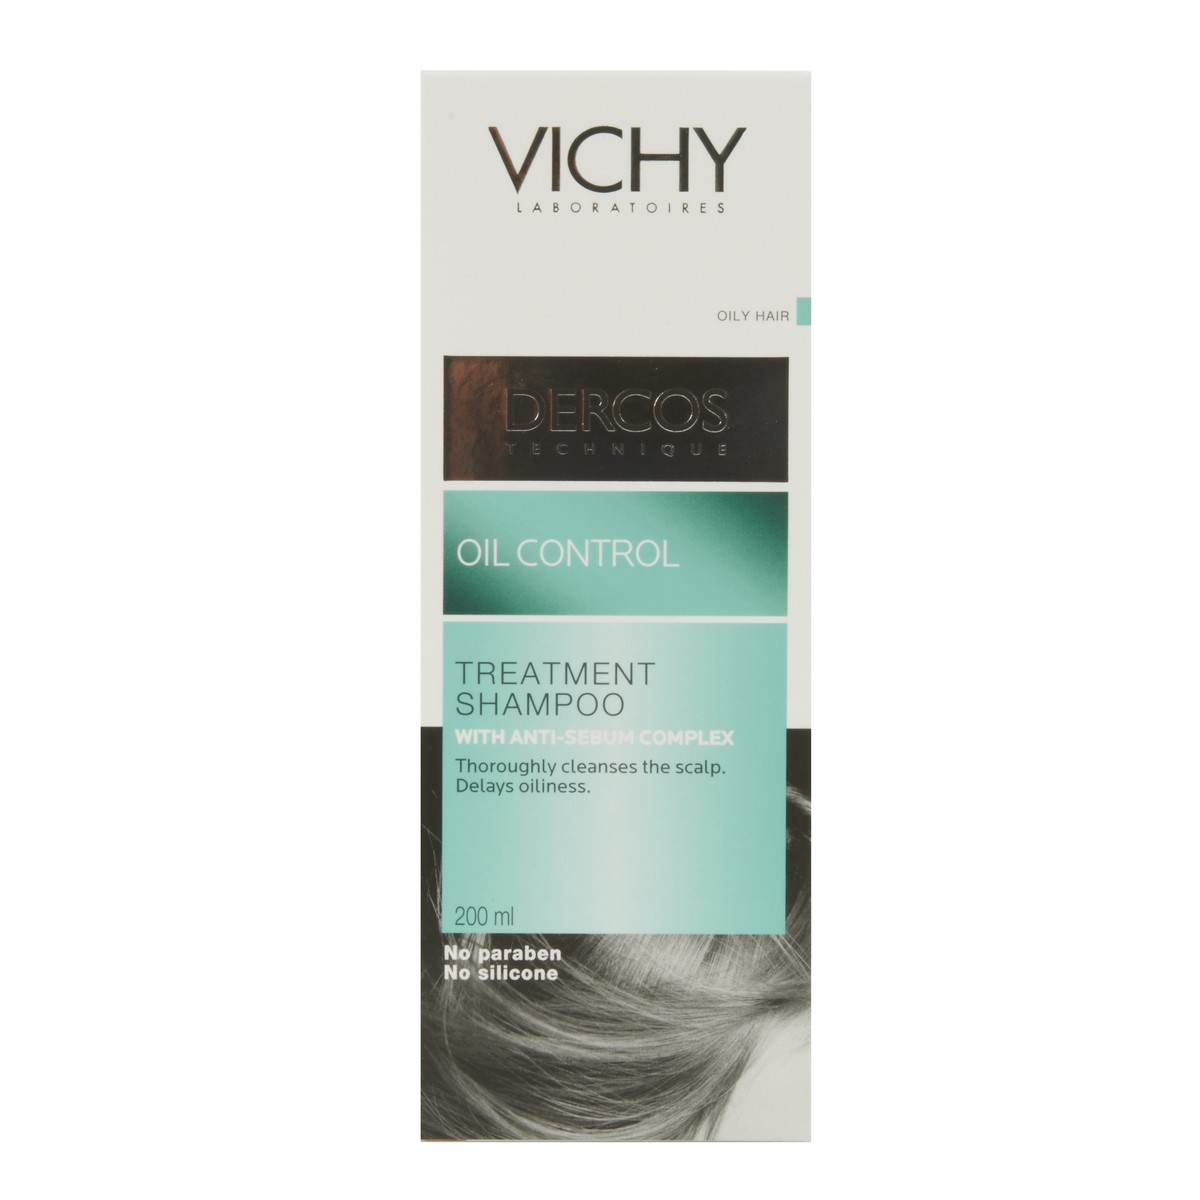 Vichy Shampoo sebo-correttore Dercos